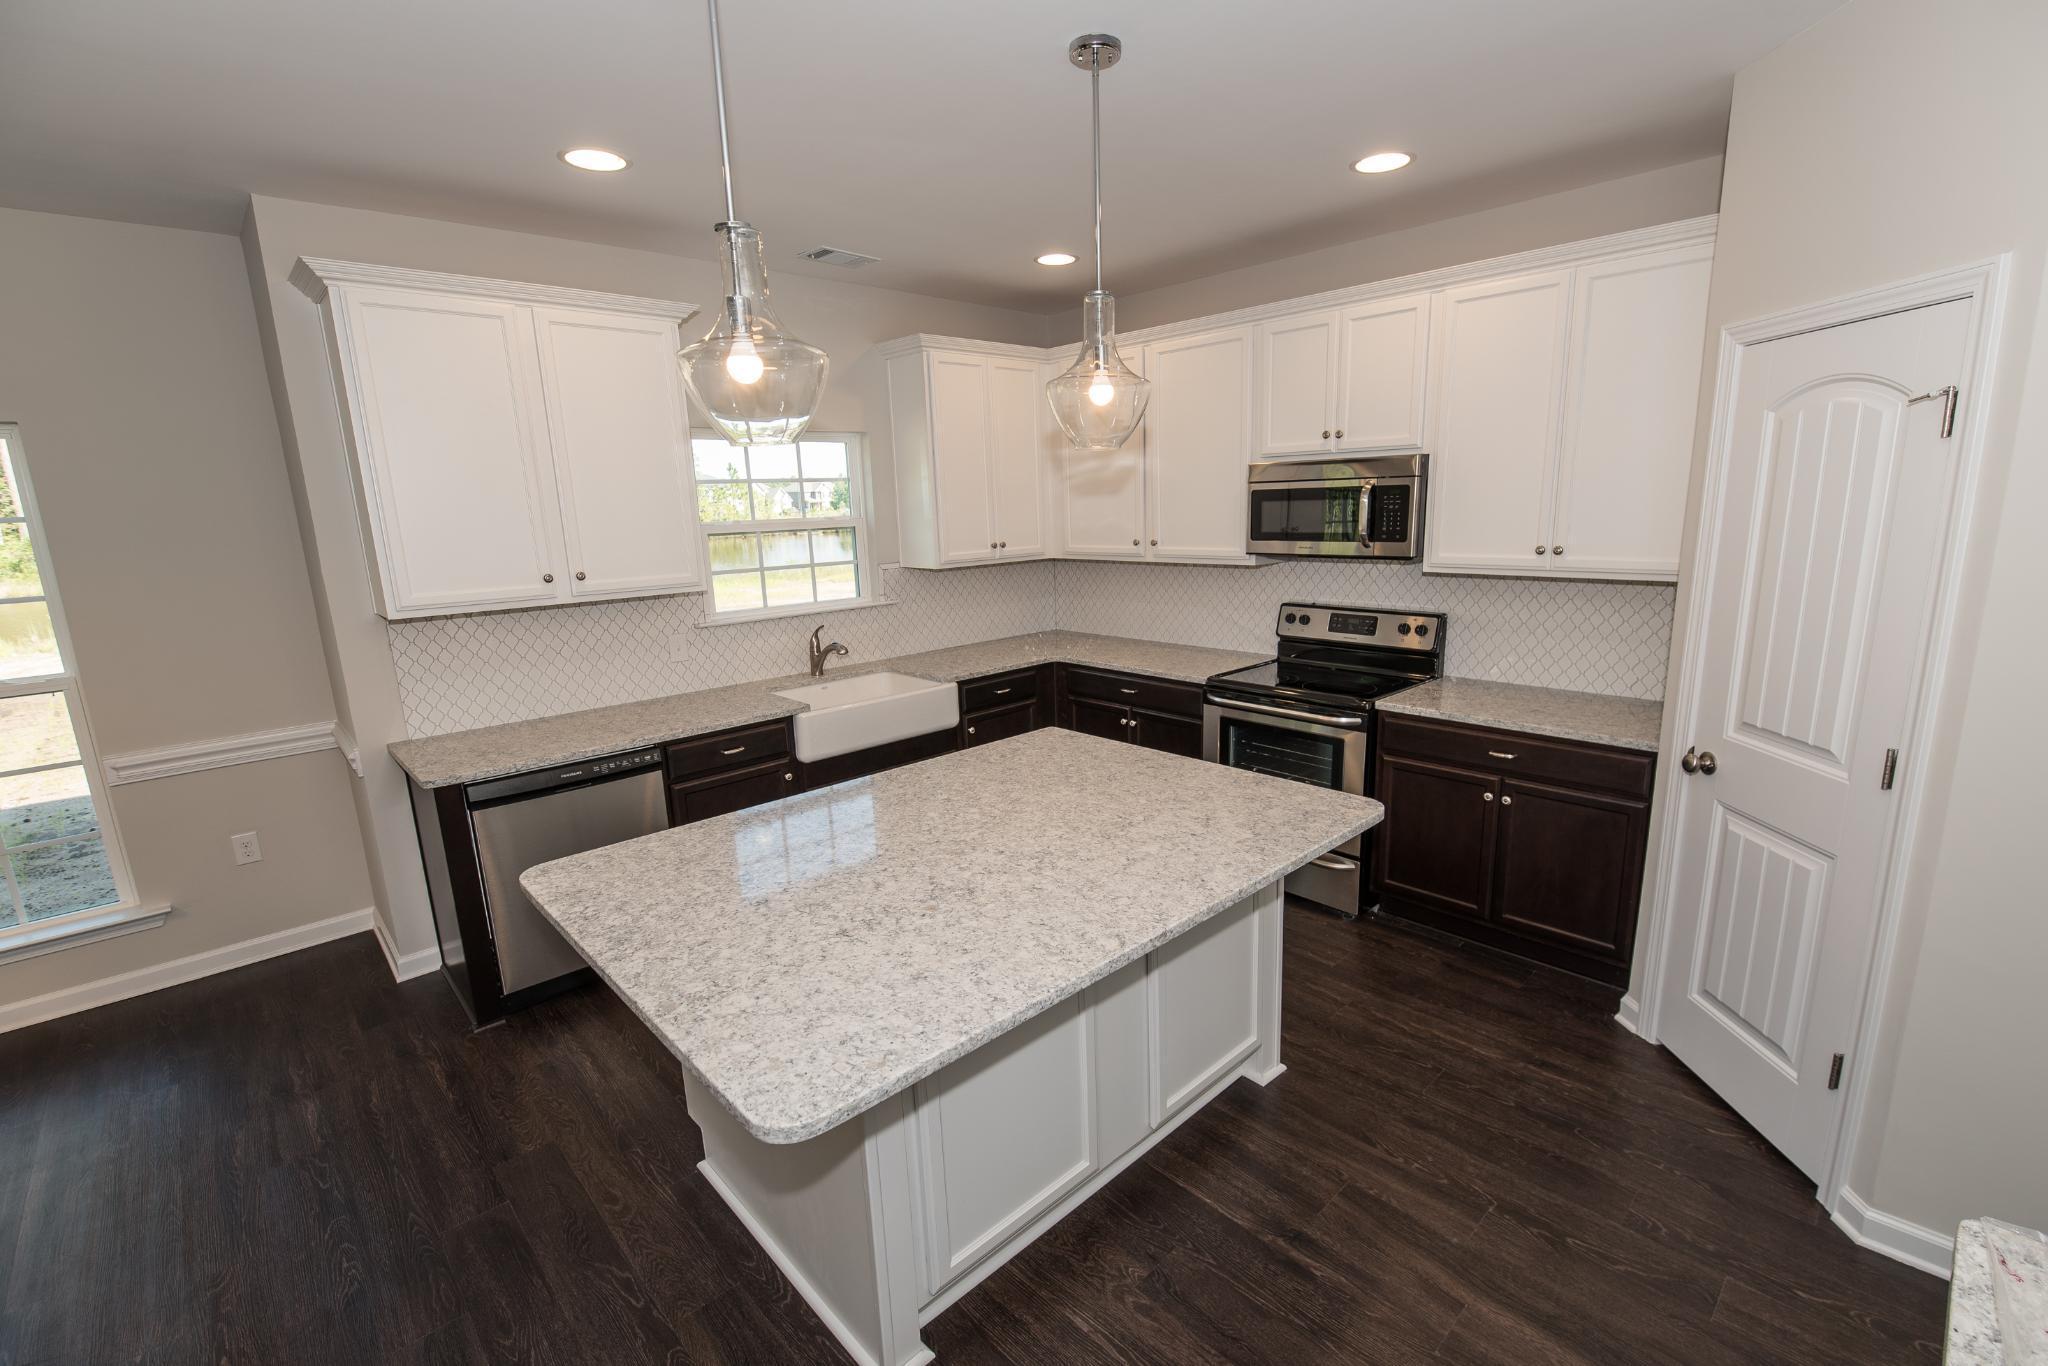 Kitchen featured in the Blackbeard By Ernest Homes in Savannah, GA